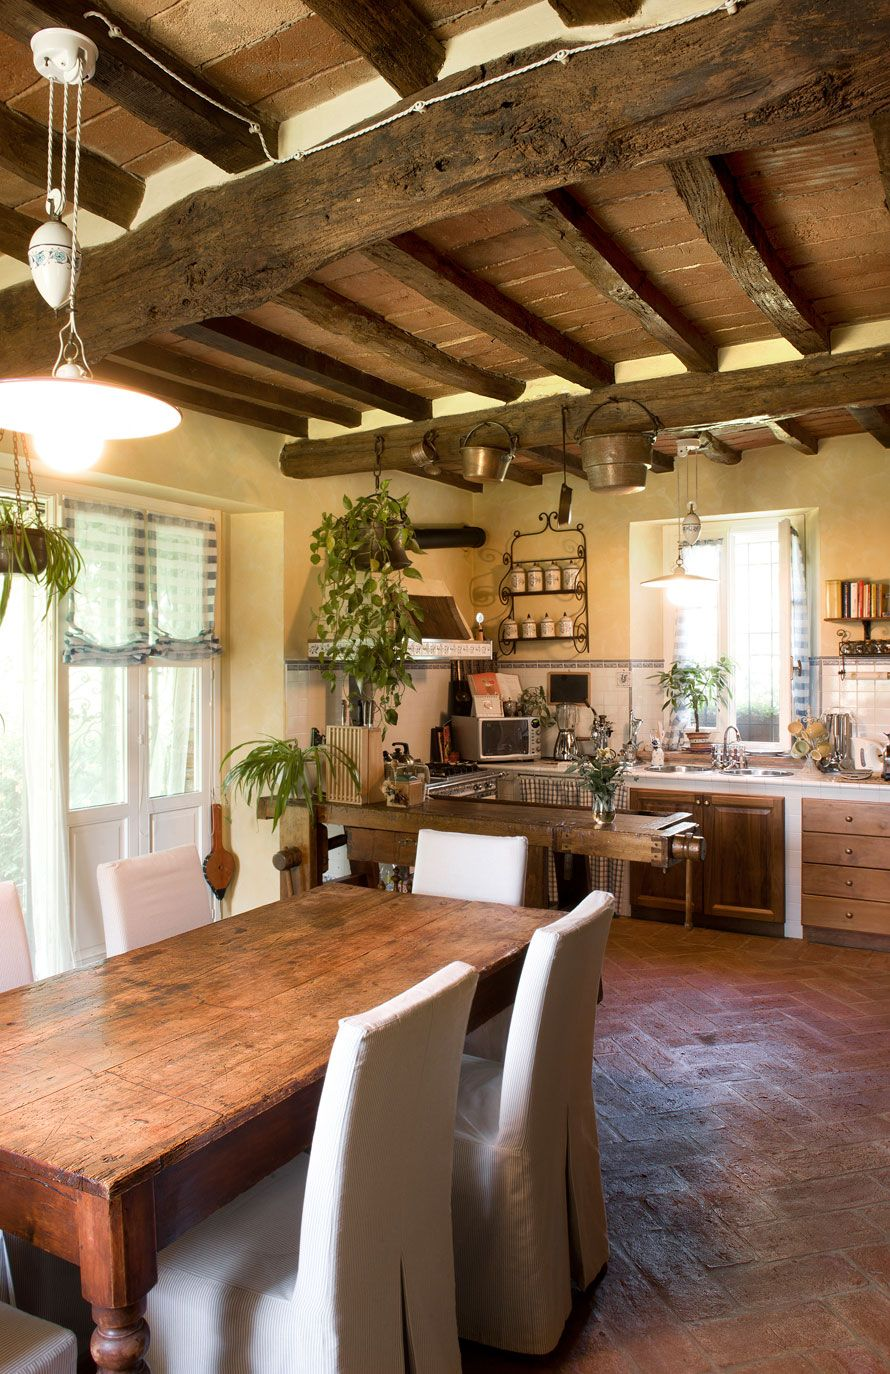 Arredamento Rustico Casa case | design rustico da cucina, arredamento rustico moderno